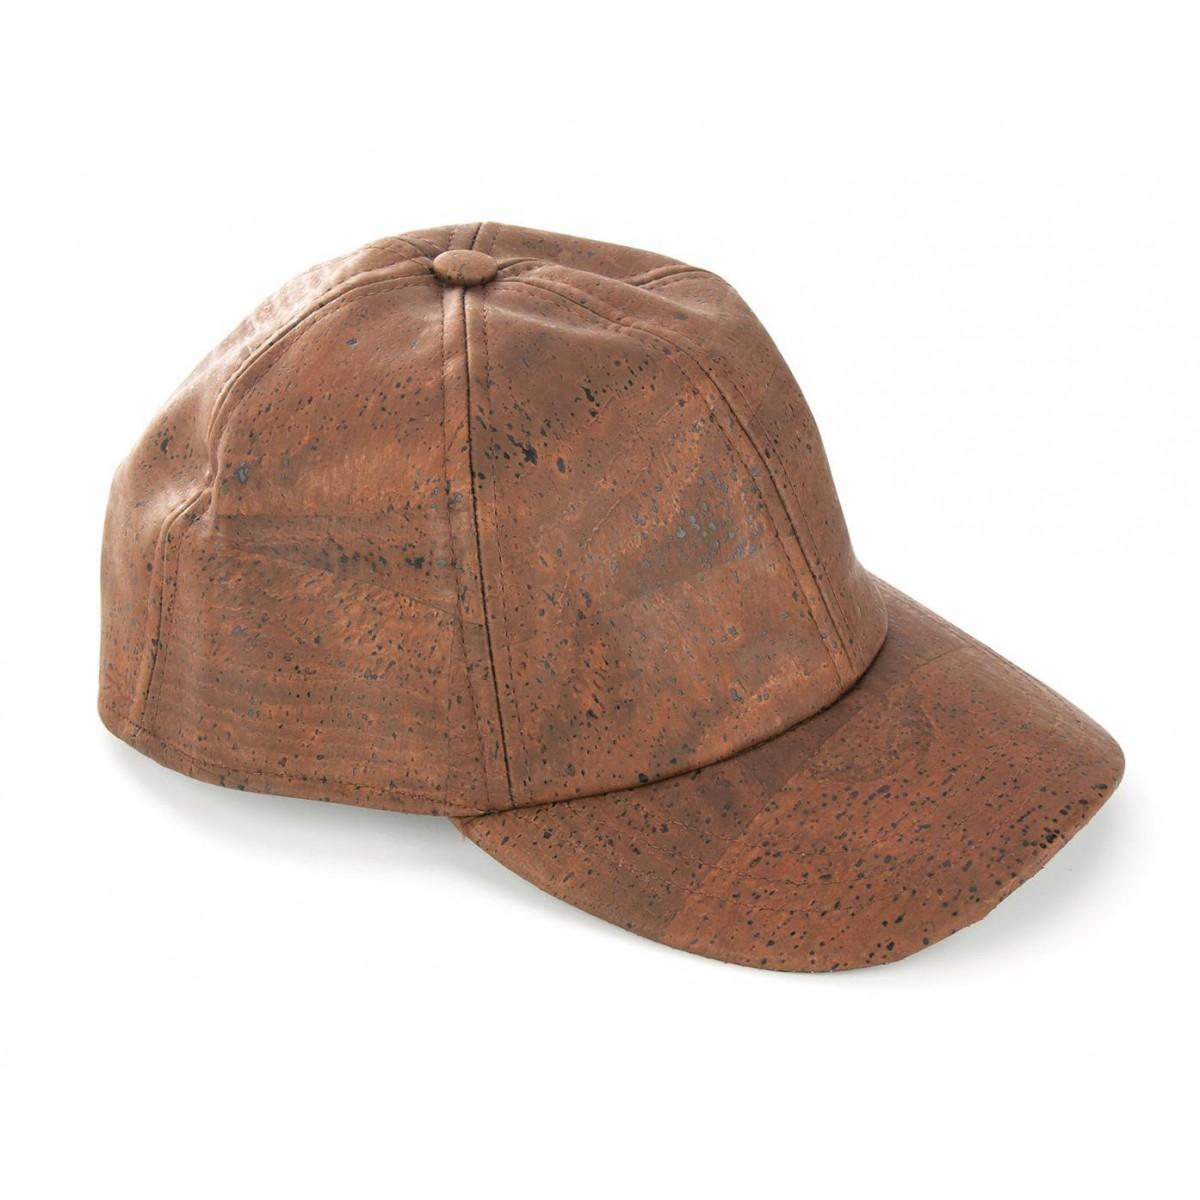 Cappelli sportivi e accessori moda sughero - Linea Vegan  9f978a093a5f